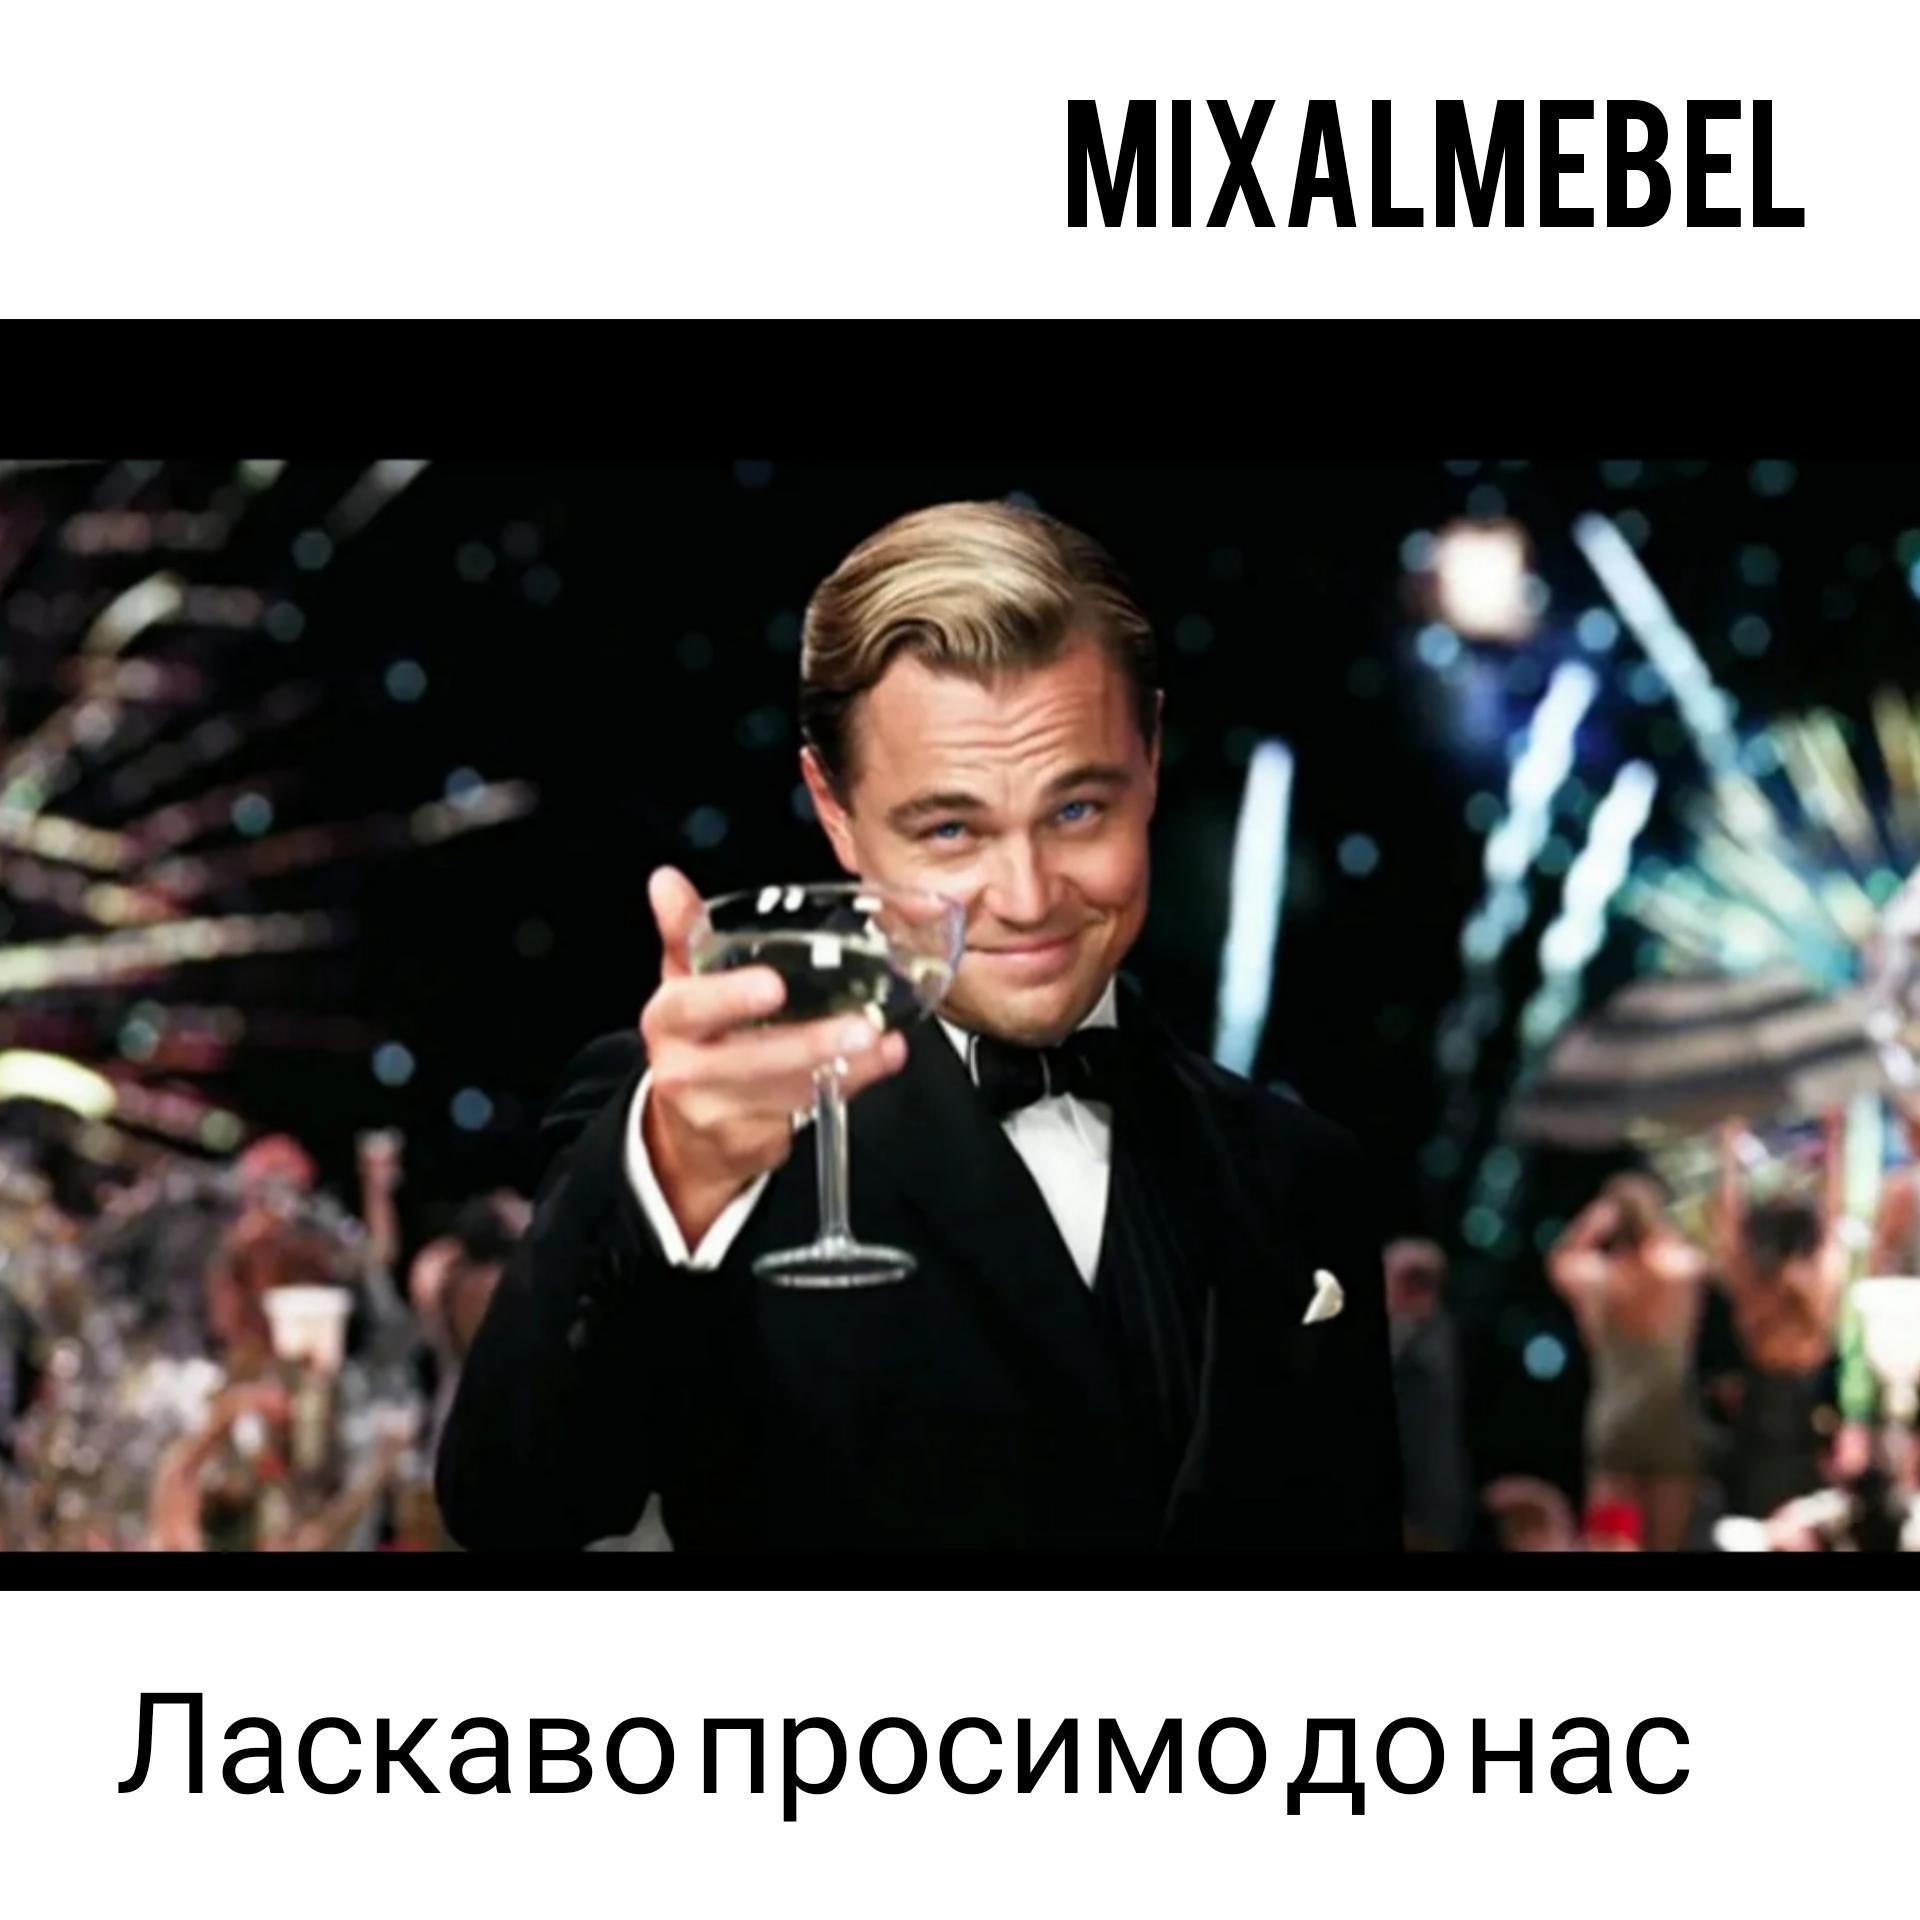 MIXALMEBEL